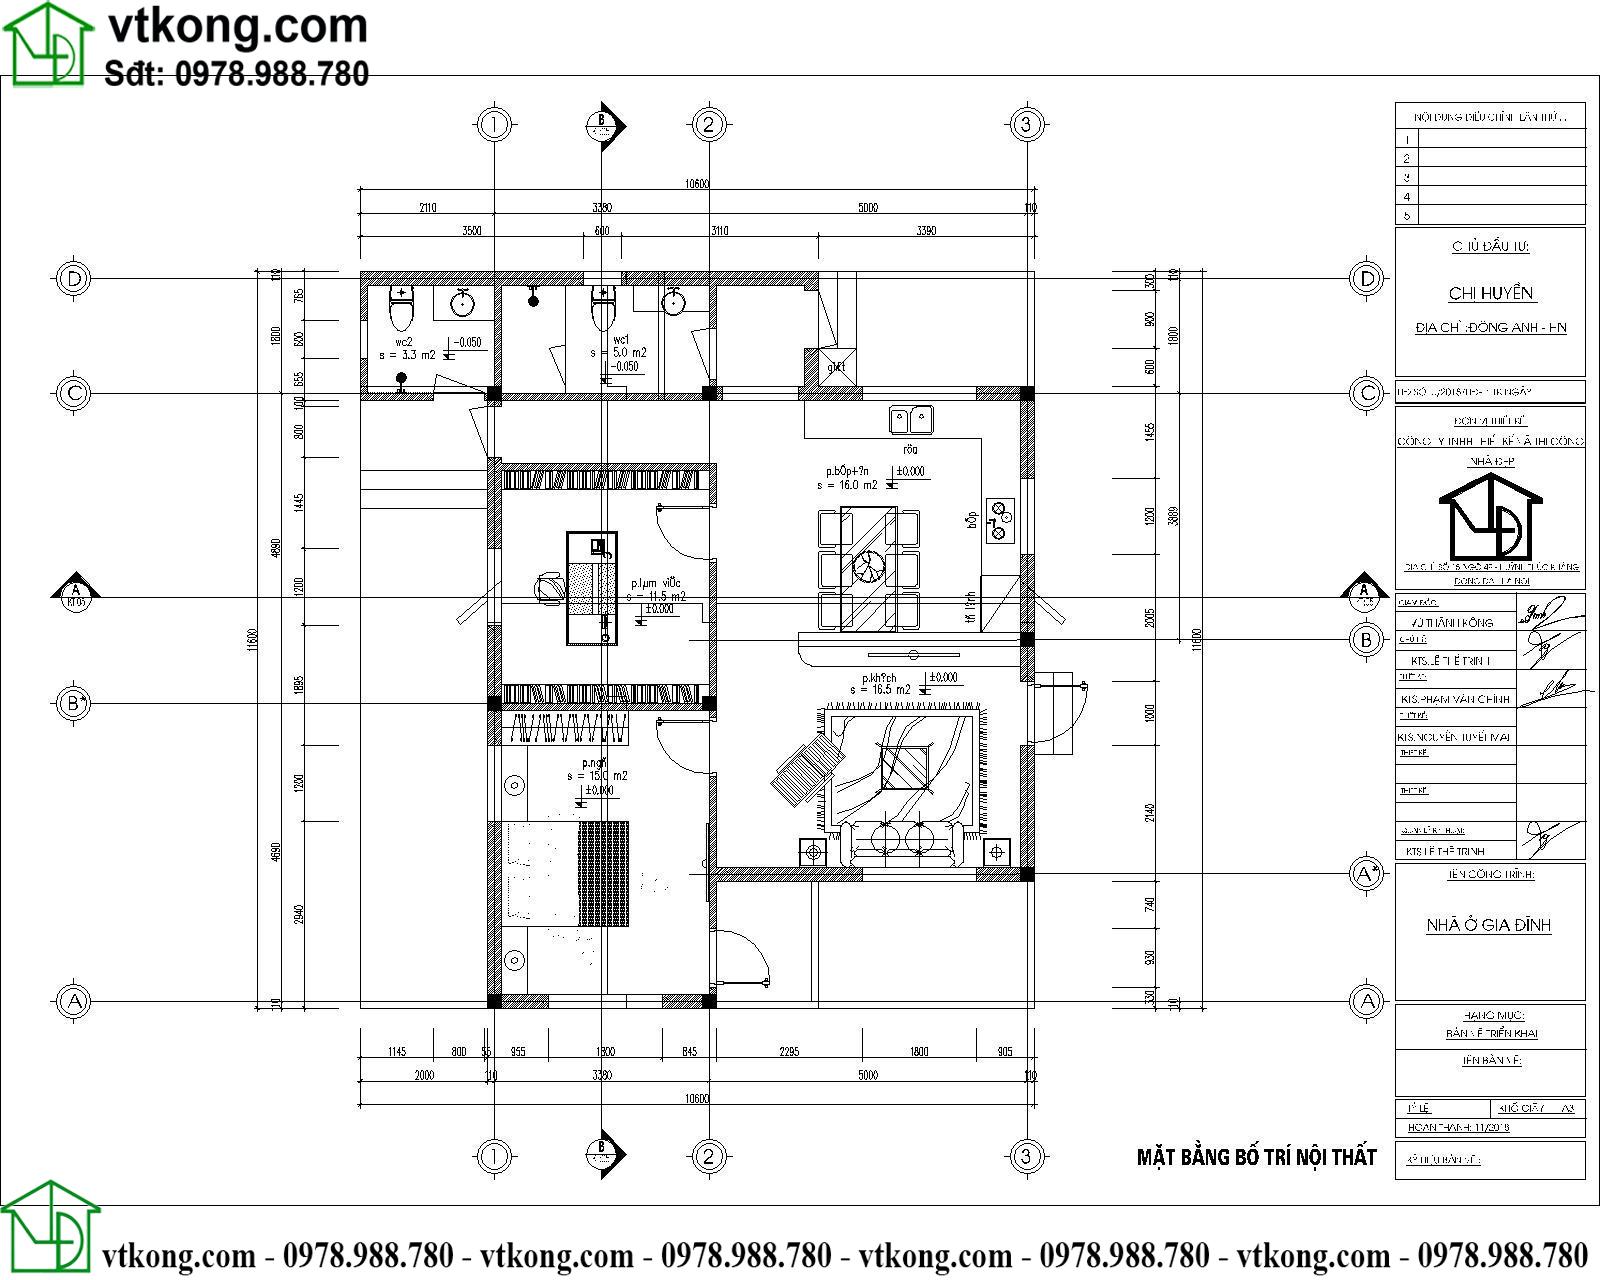 Mat-bang-cong-nang-nha-cap-4-mai-thai-11x10m-tai-nghe-an-nc4120